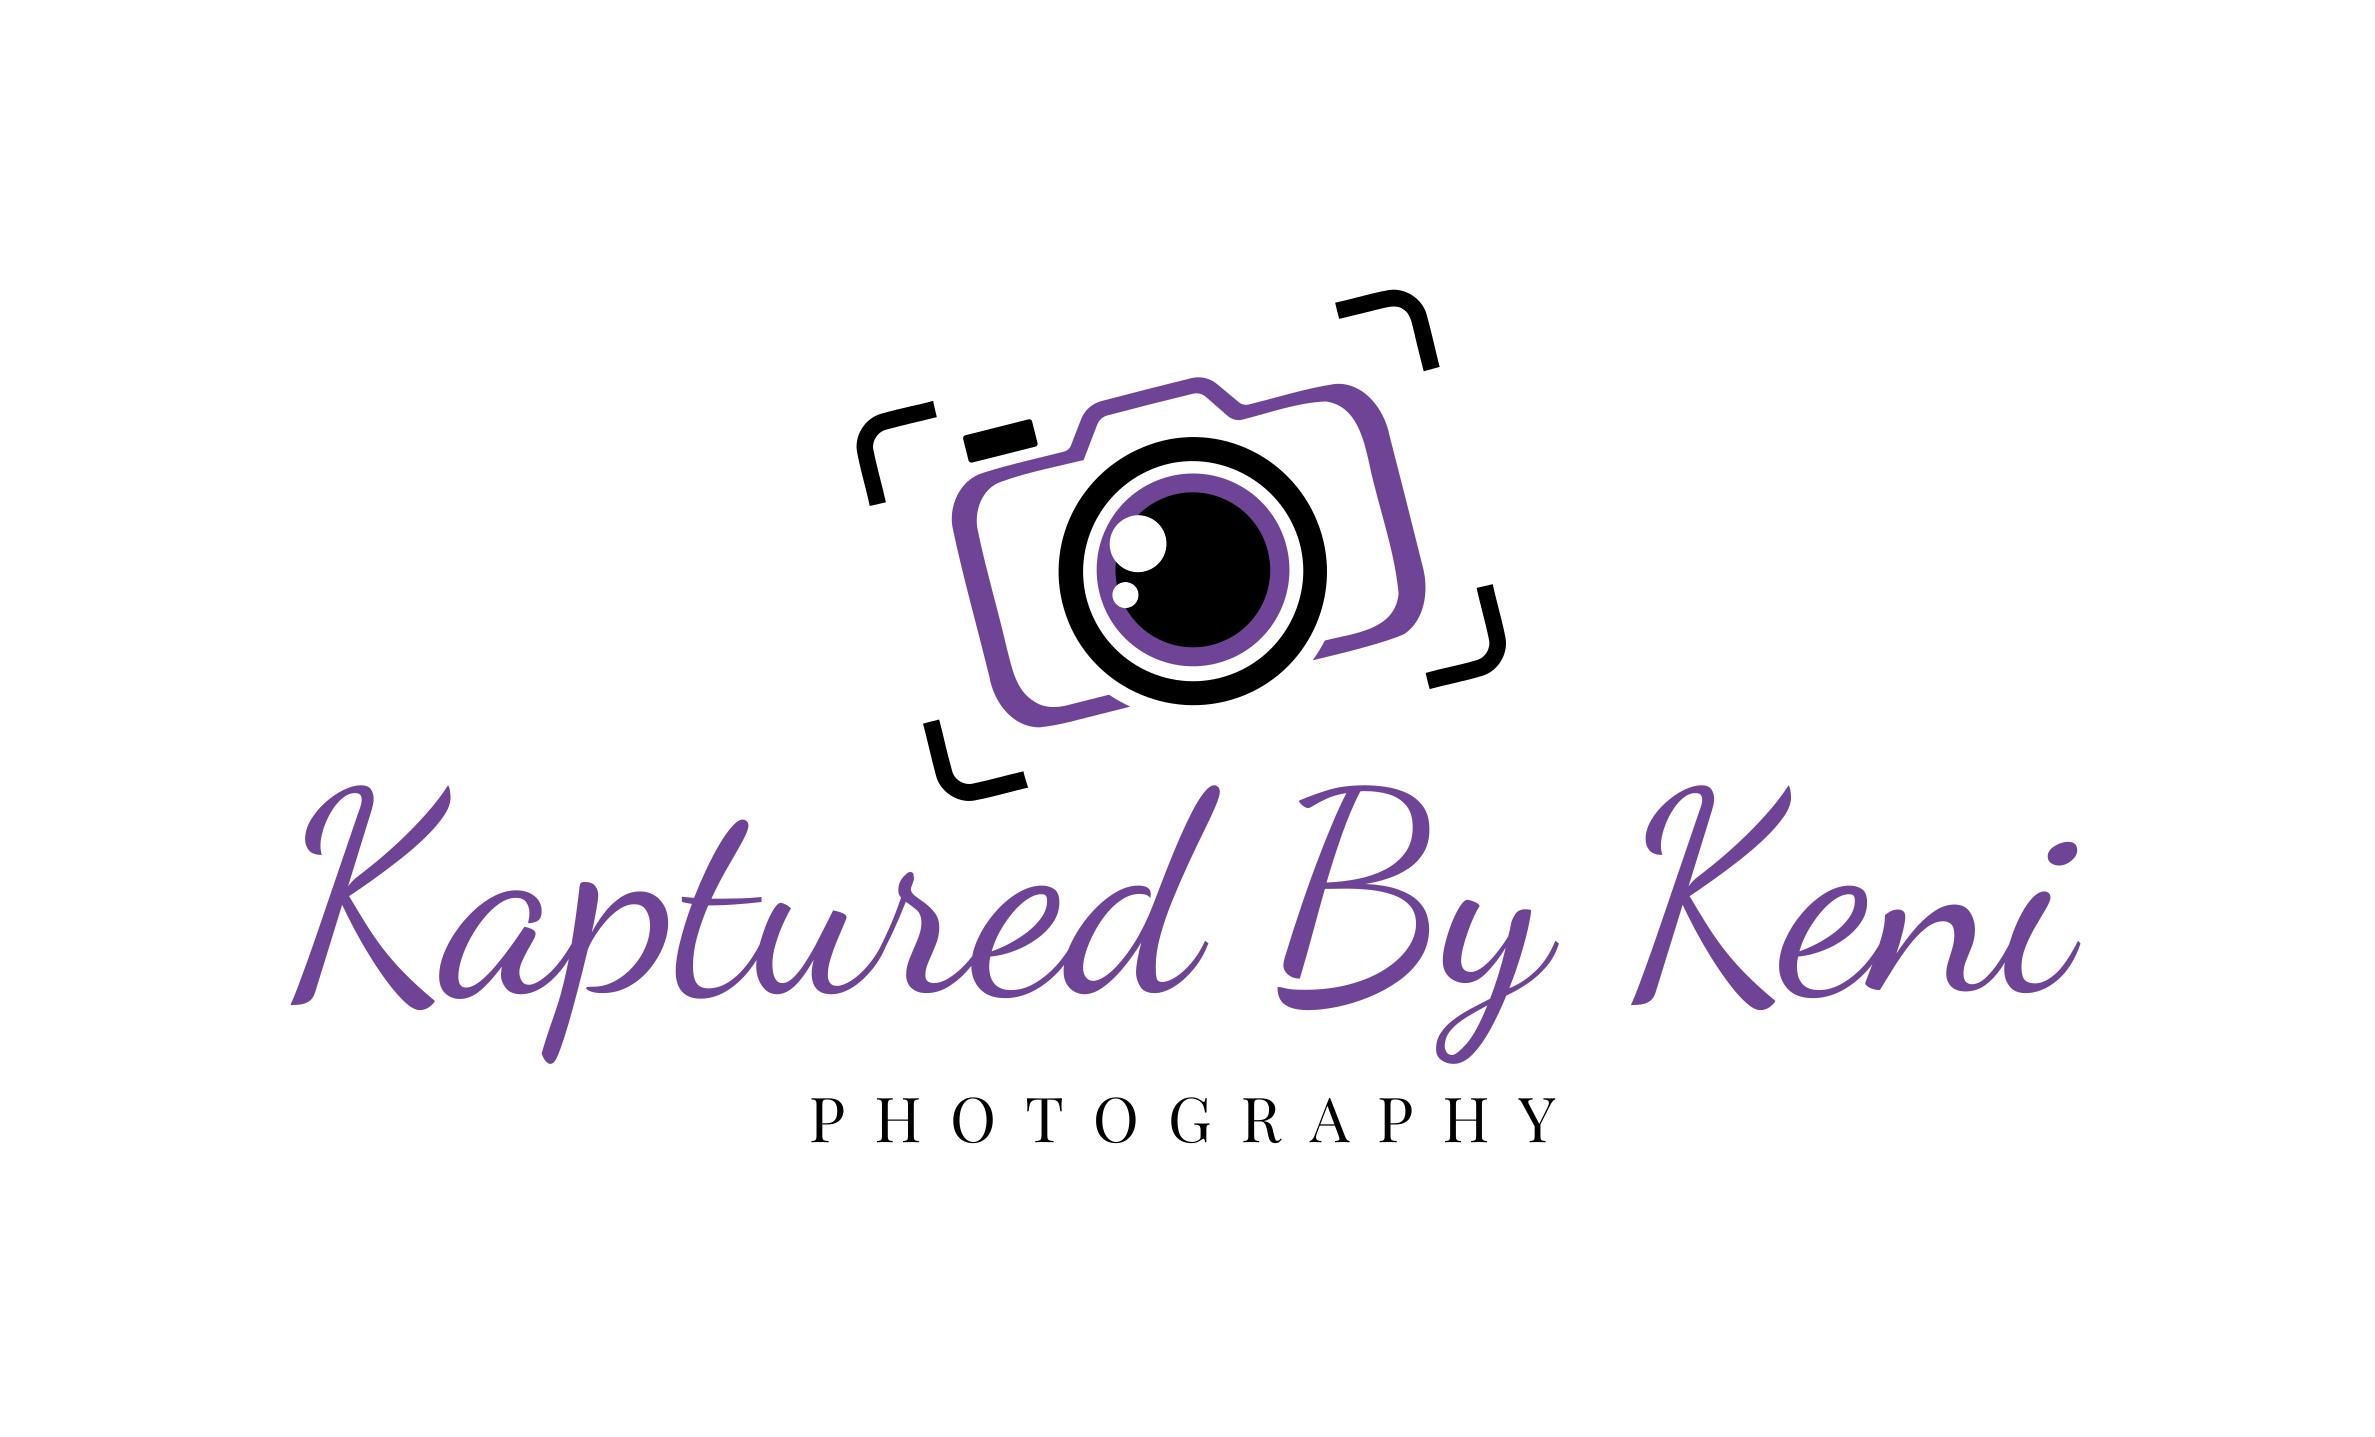 Kaptured by Keni Photography